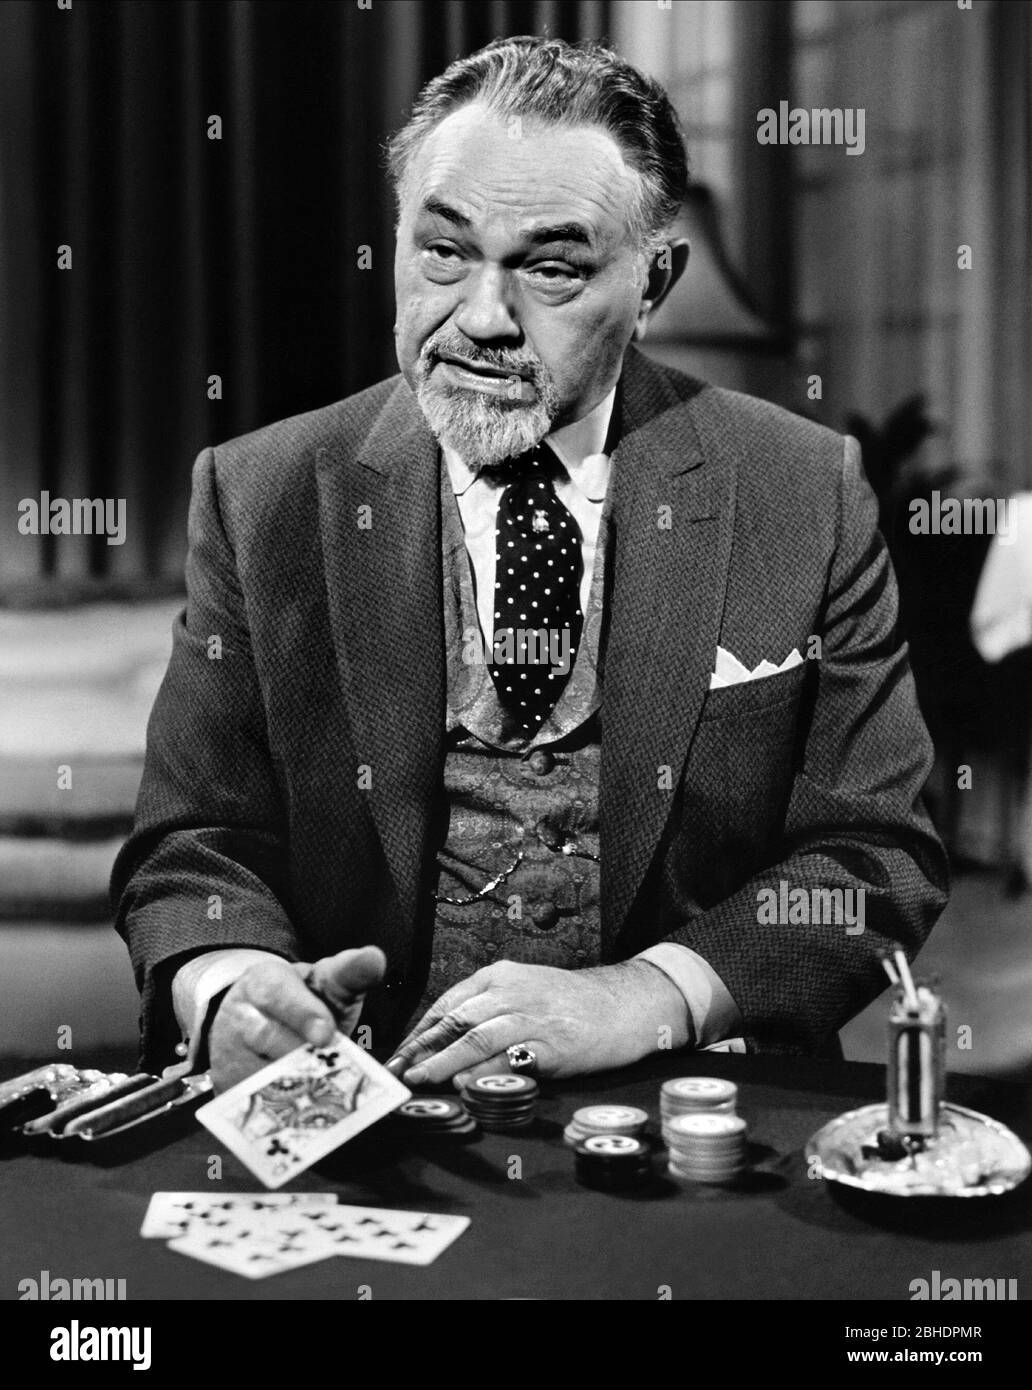 EDWARD G. ROBINSON, THE CINCINNATI KID, 1965 Stock Photo